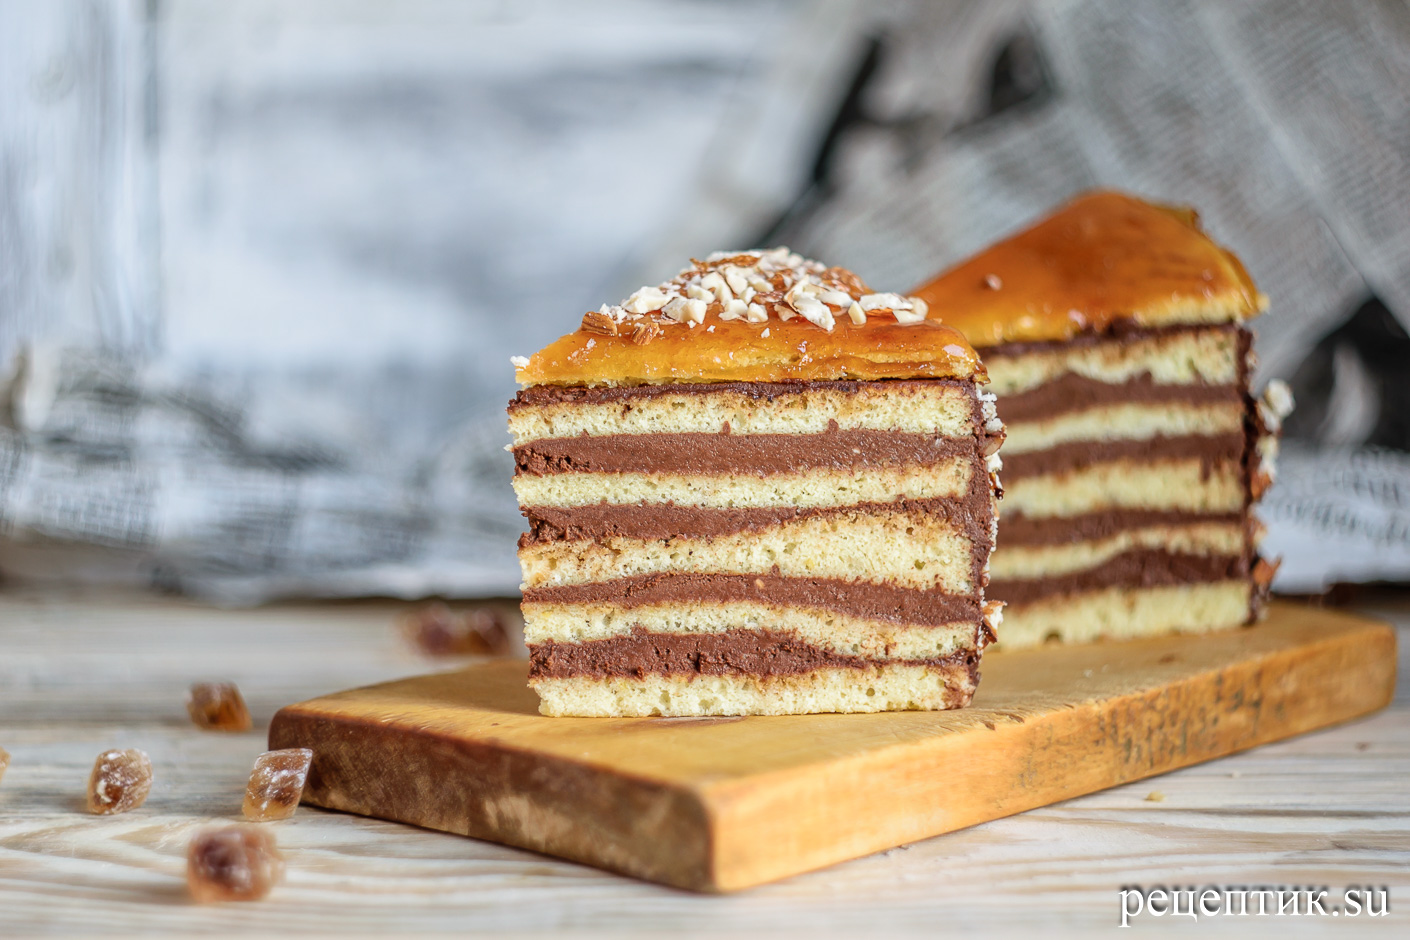 Торт «Добош» - рецепт с фото, шаг 30